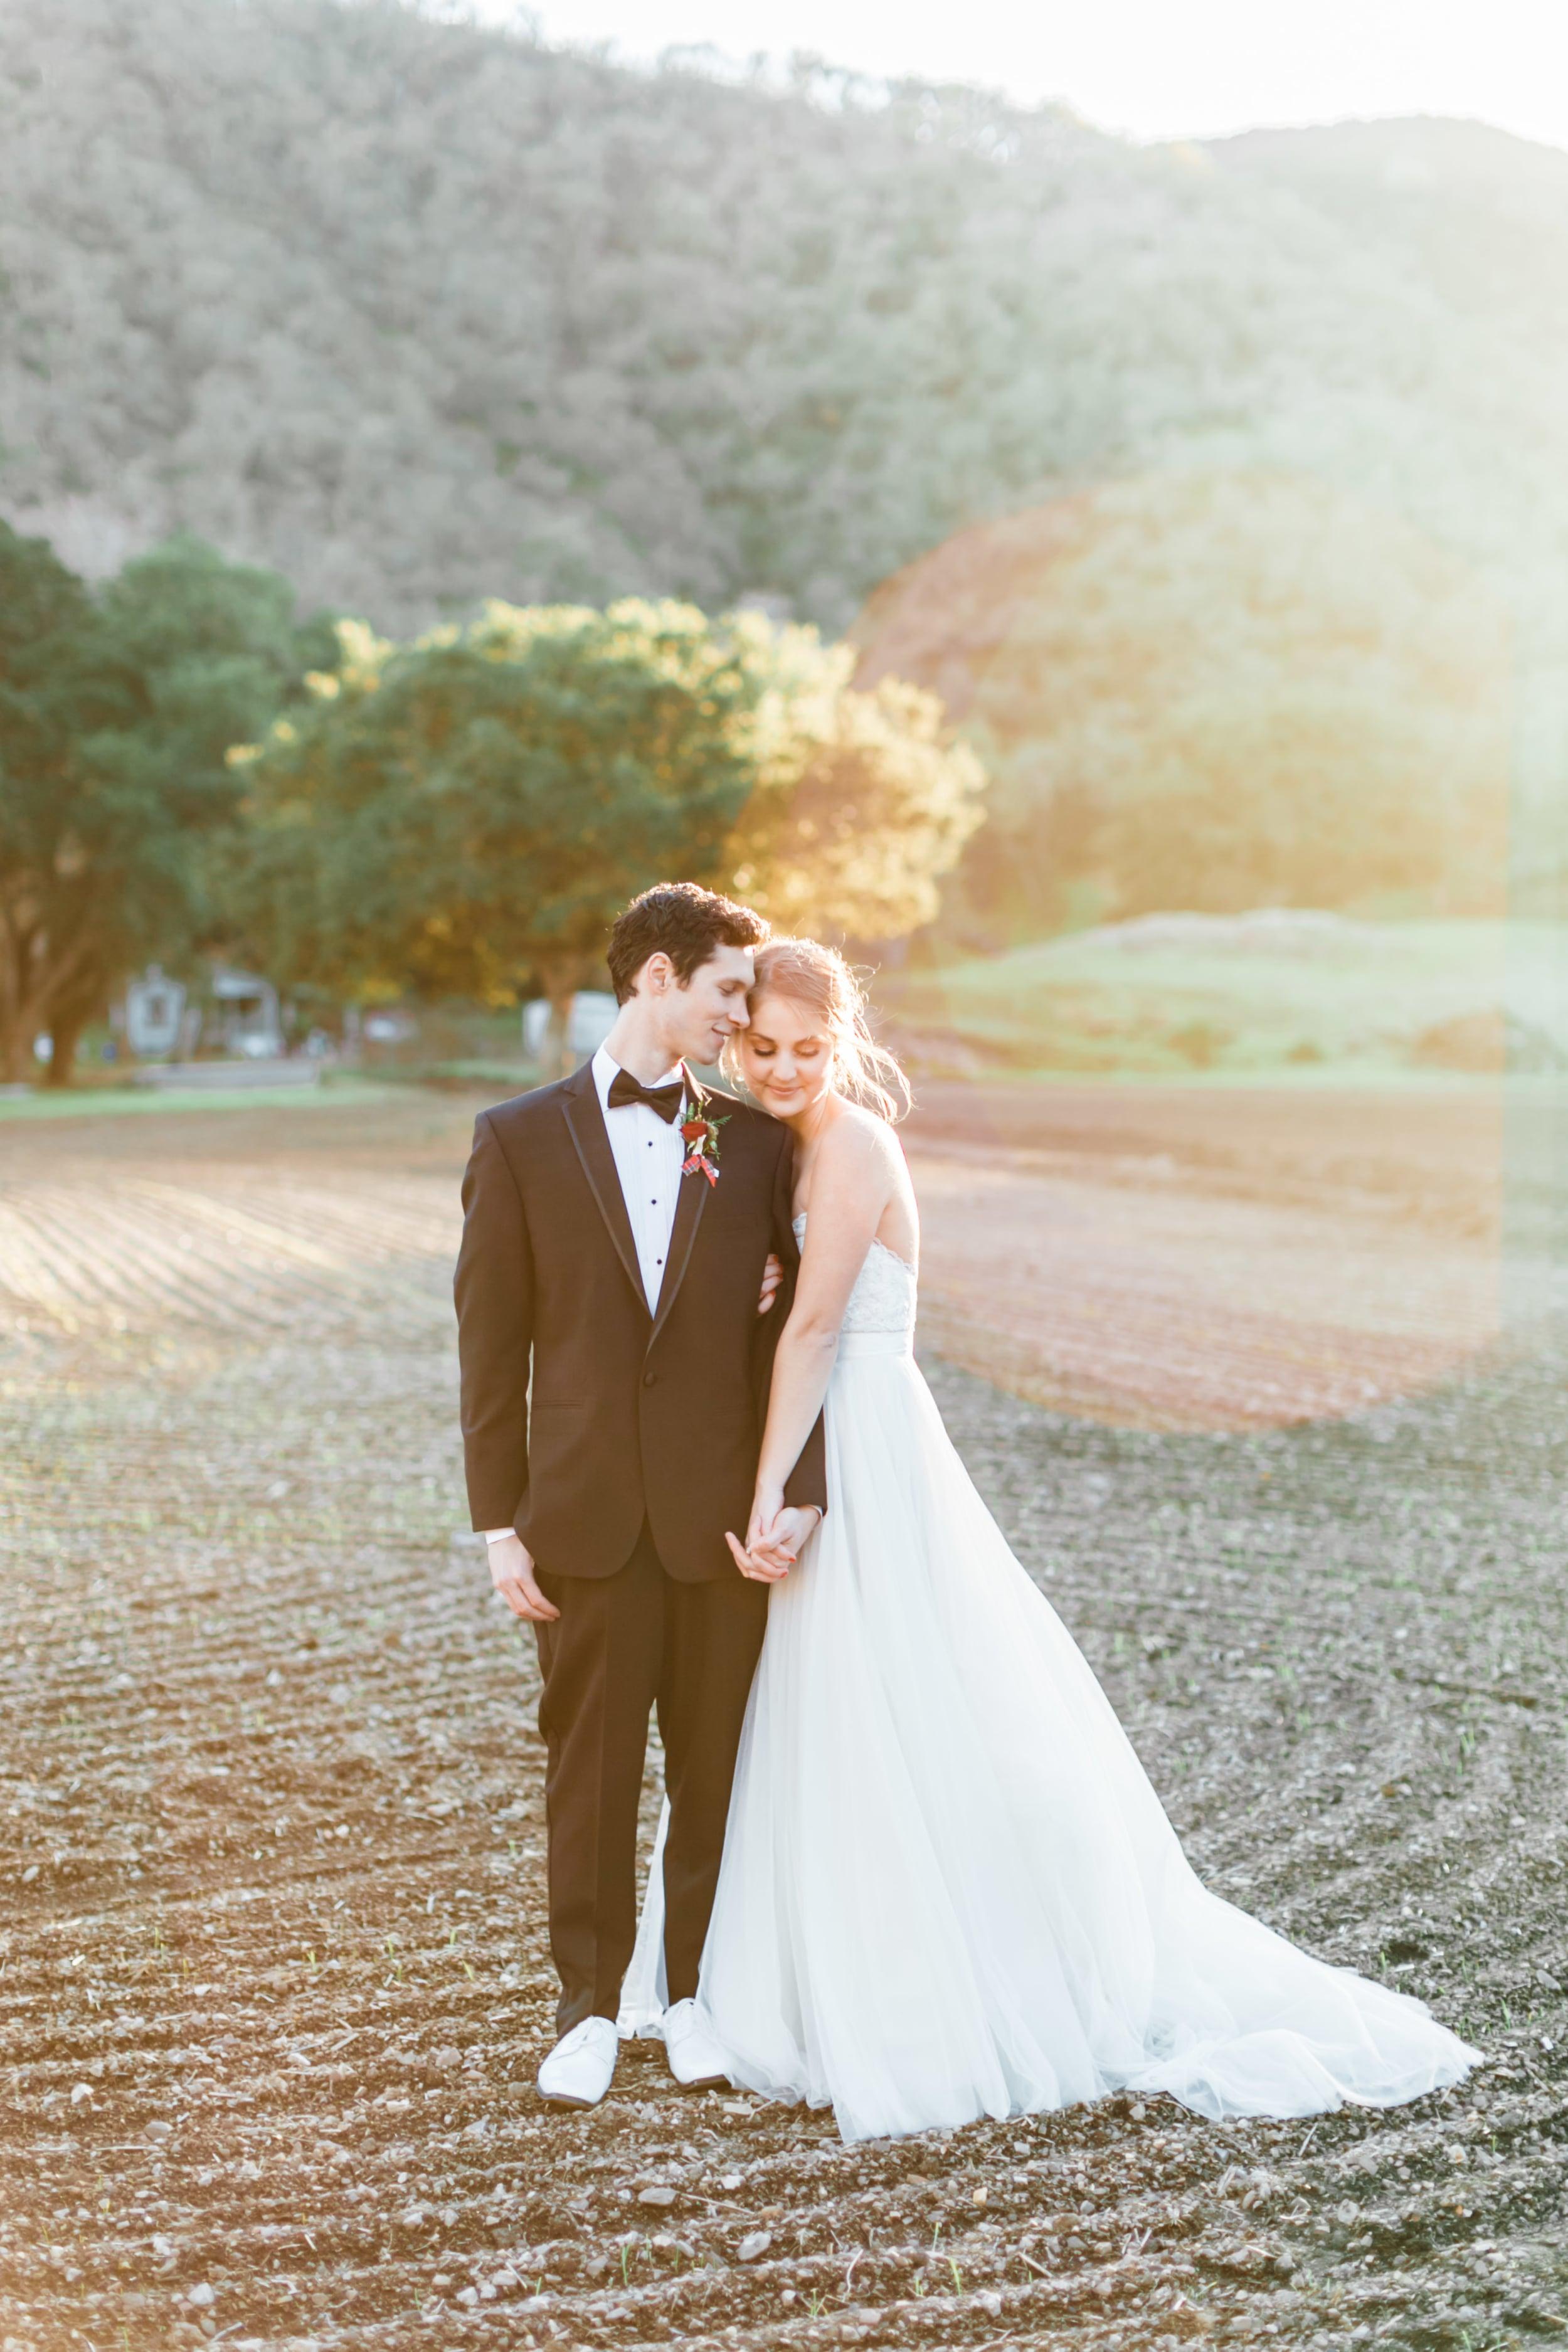 Natalie_Schutt_Photography_Winter_Wedding_San_Luis_Obispo-190.jpg